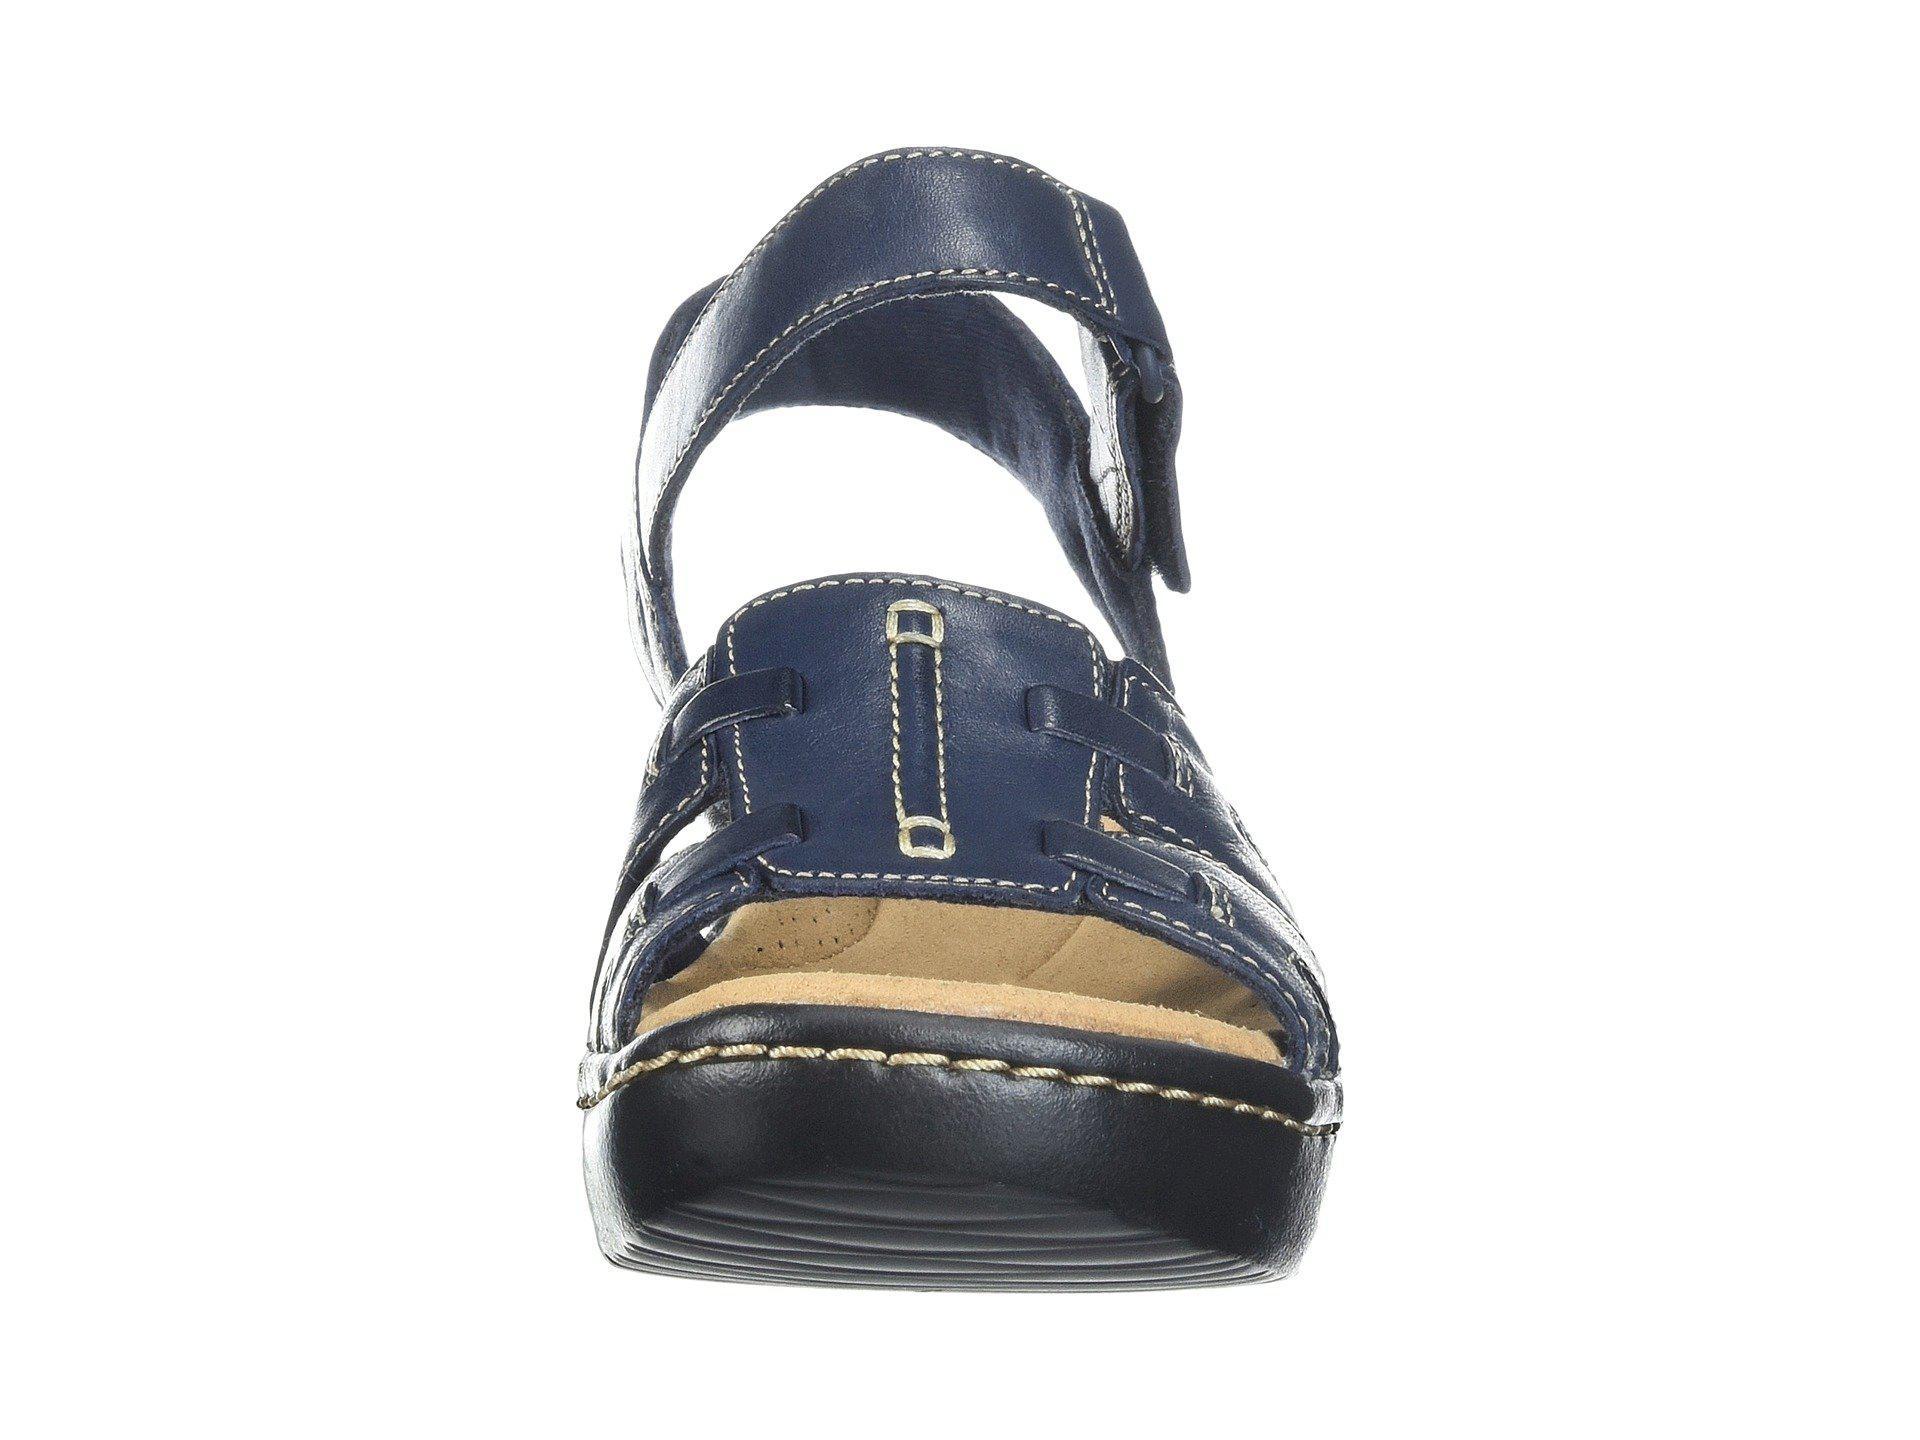 f6903e871d01 Lyst - Clarks Delana Nila (black Leather) Women s Sandals in Blue